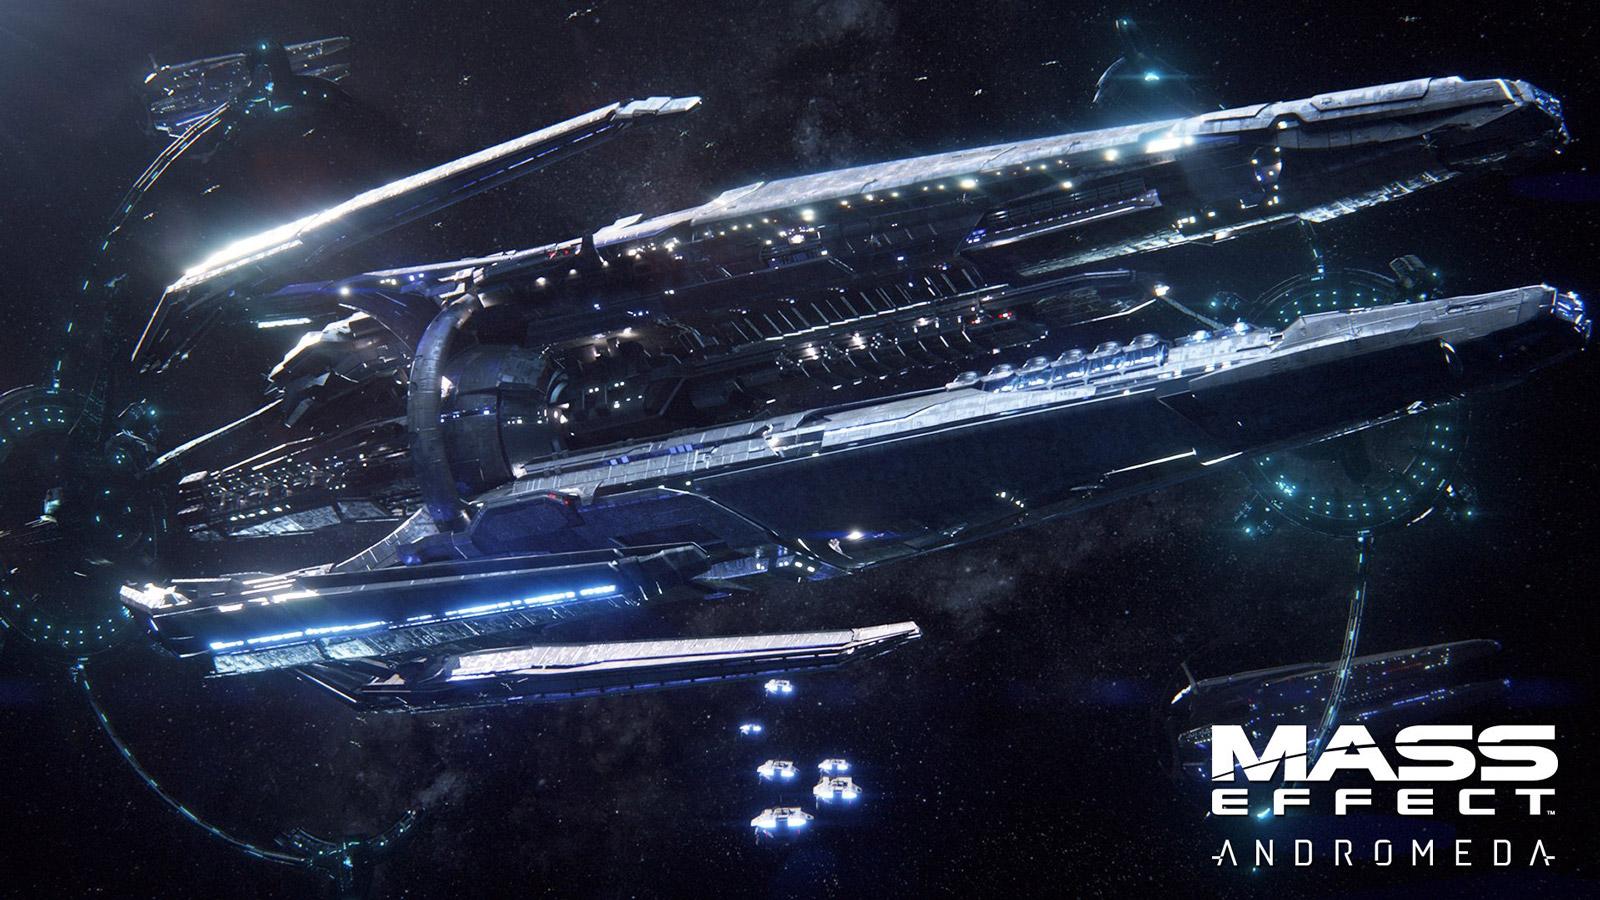 Mass Effect Andromeda Hyperion 202753 Hd Wallpaper